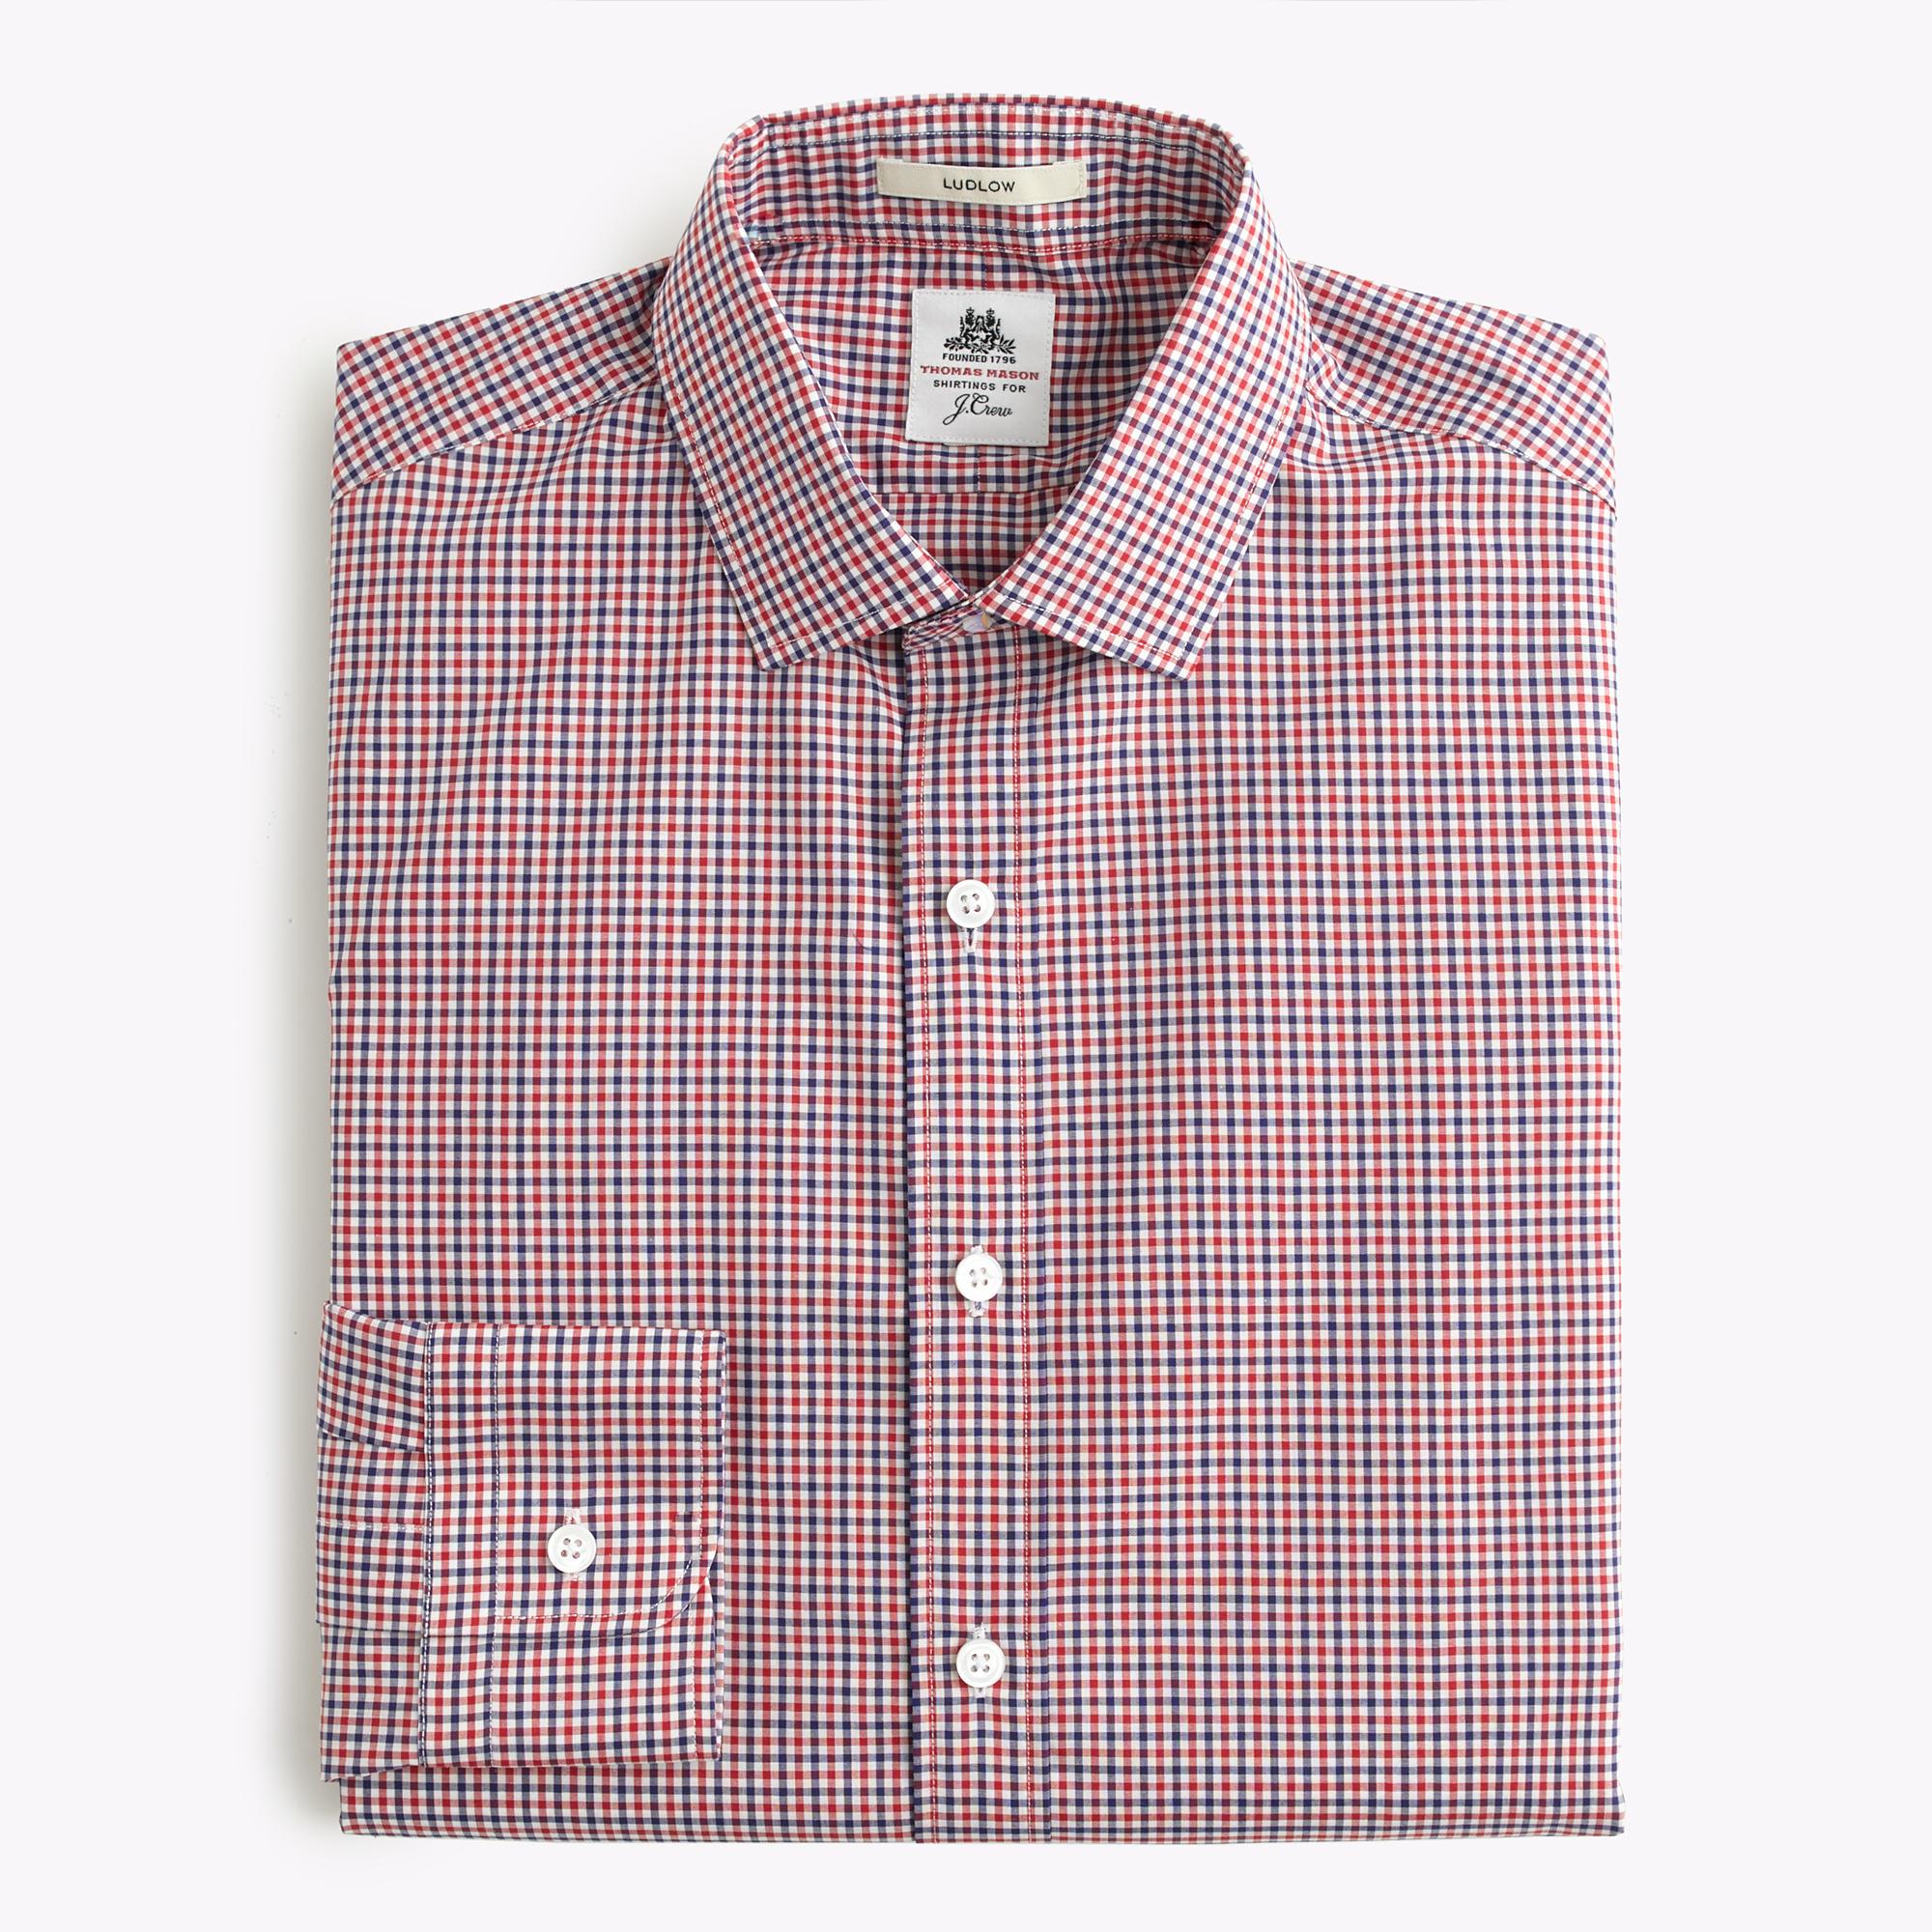 Thomas mason ludlow shirt in gingham for men lyst for Thomas mason dress shirts